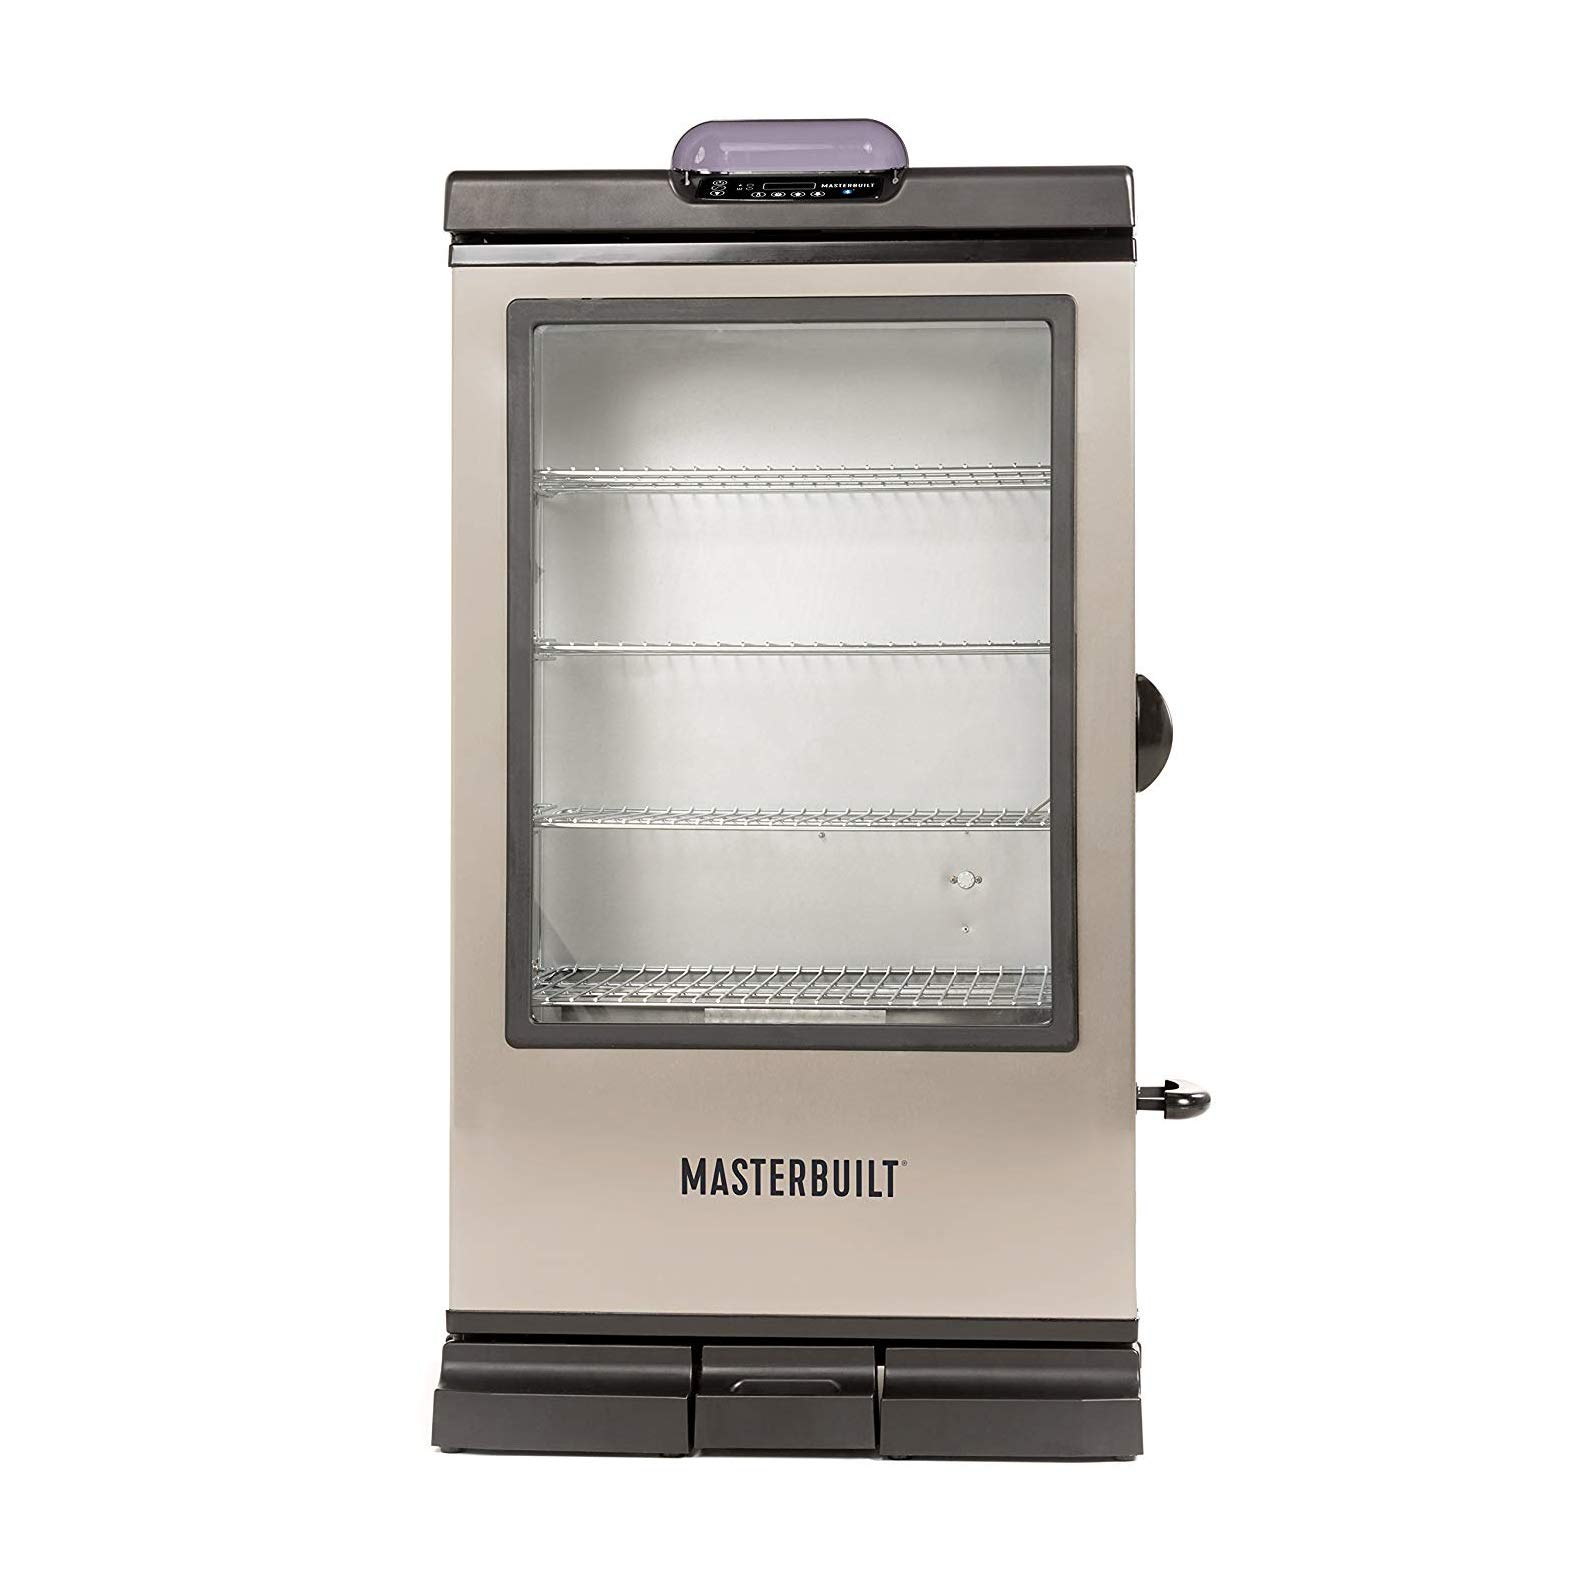 Masterbuilt MB20076718 Bluetooth Electric Smoker 240G Digital, Black with SS Door by Masterbuilt